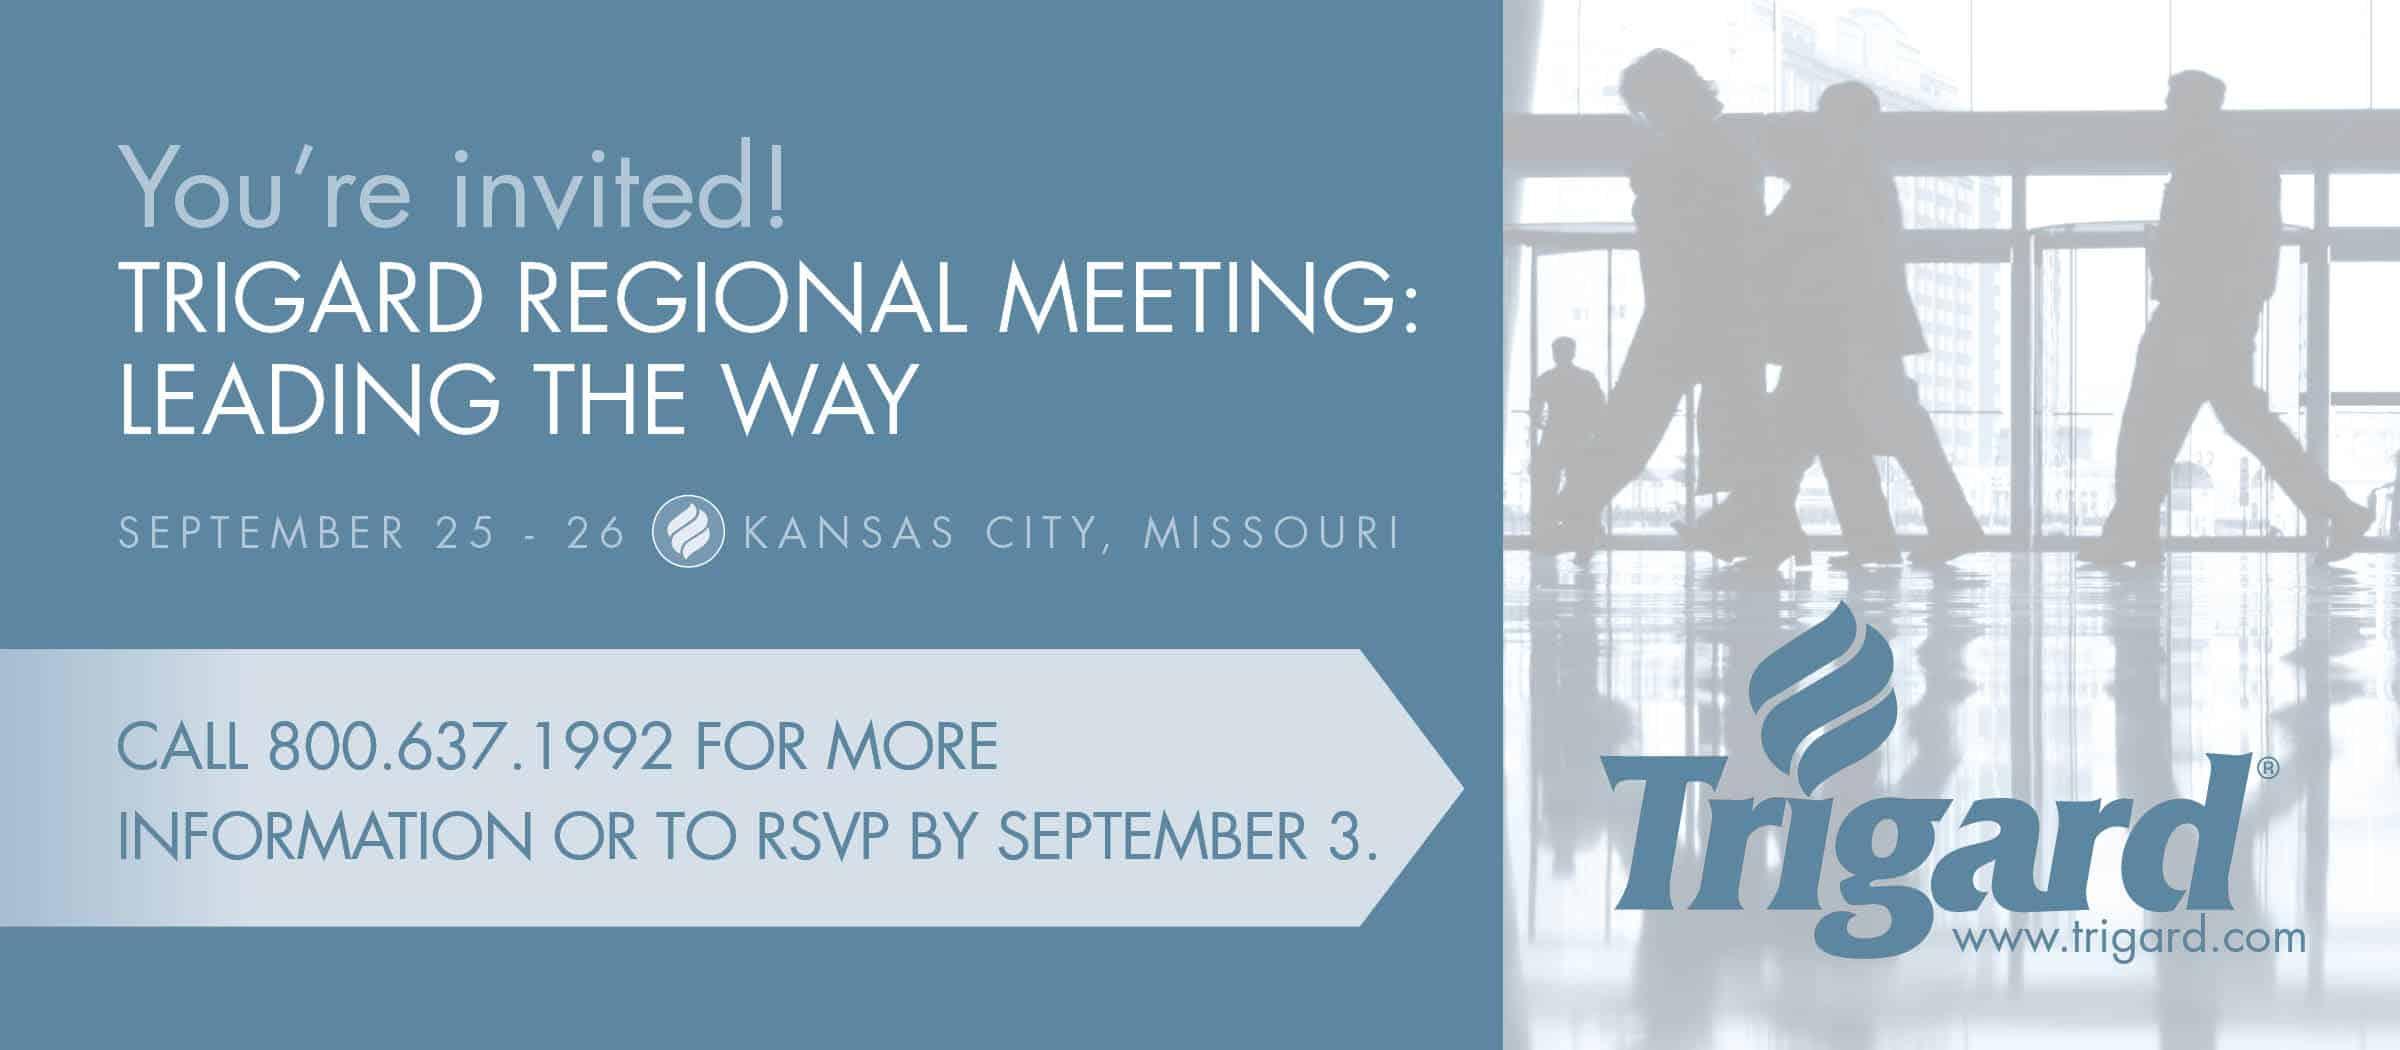 Fall Trigard Regional Meeting